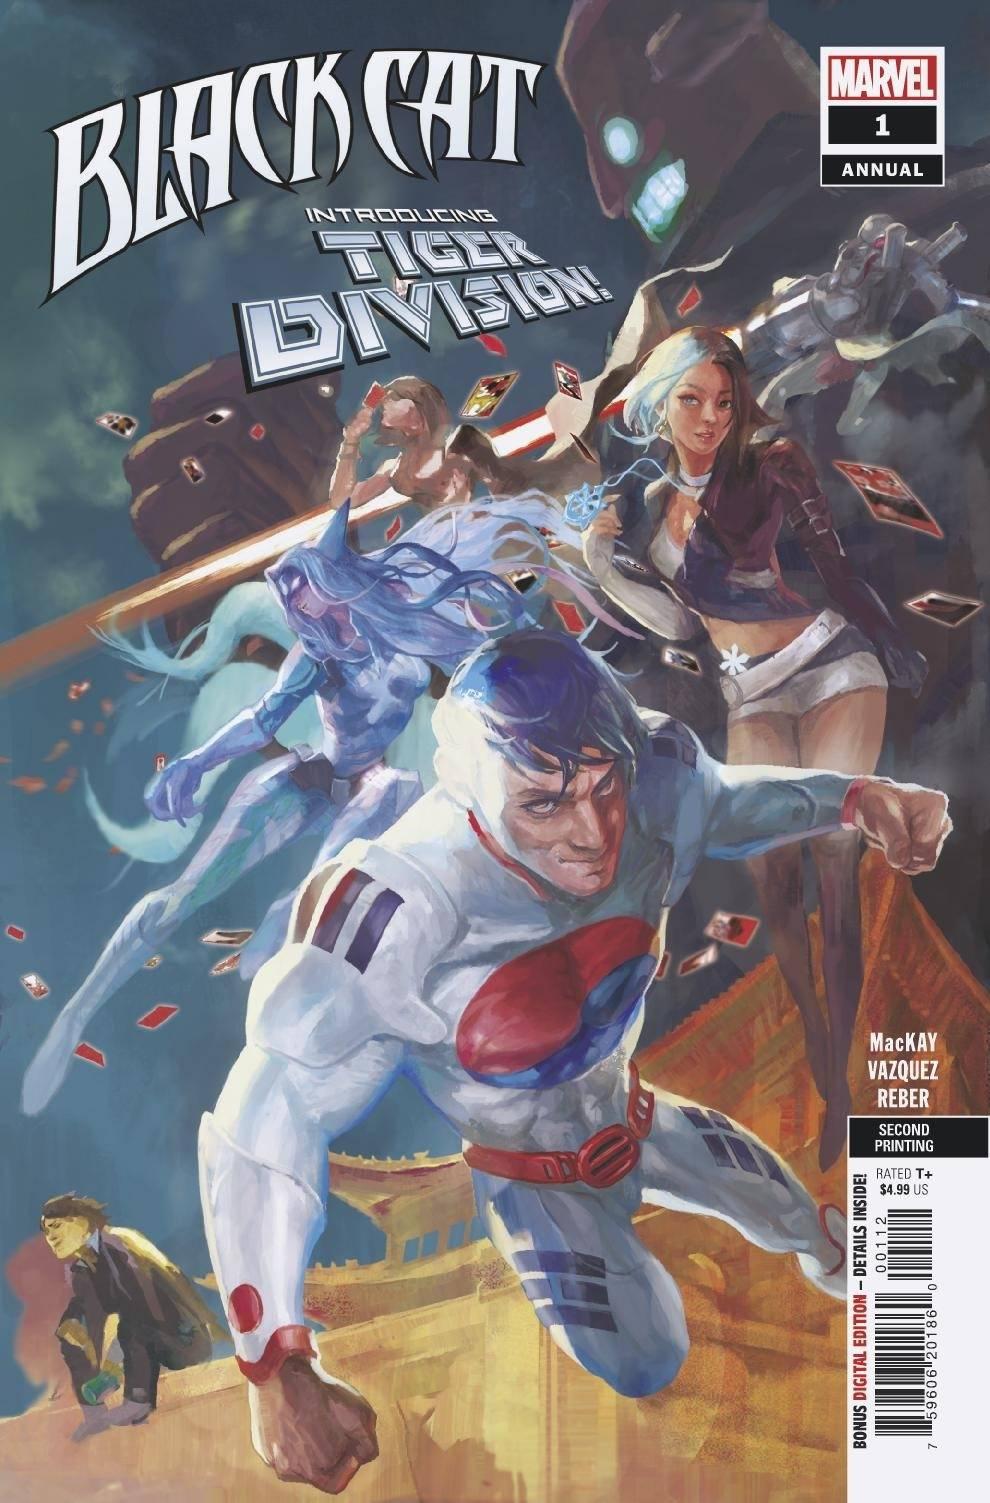 STL203606 ComicList: Marvel Comics New Releases for 08/11/2021